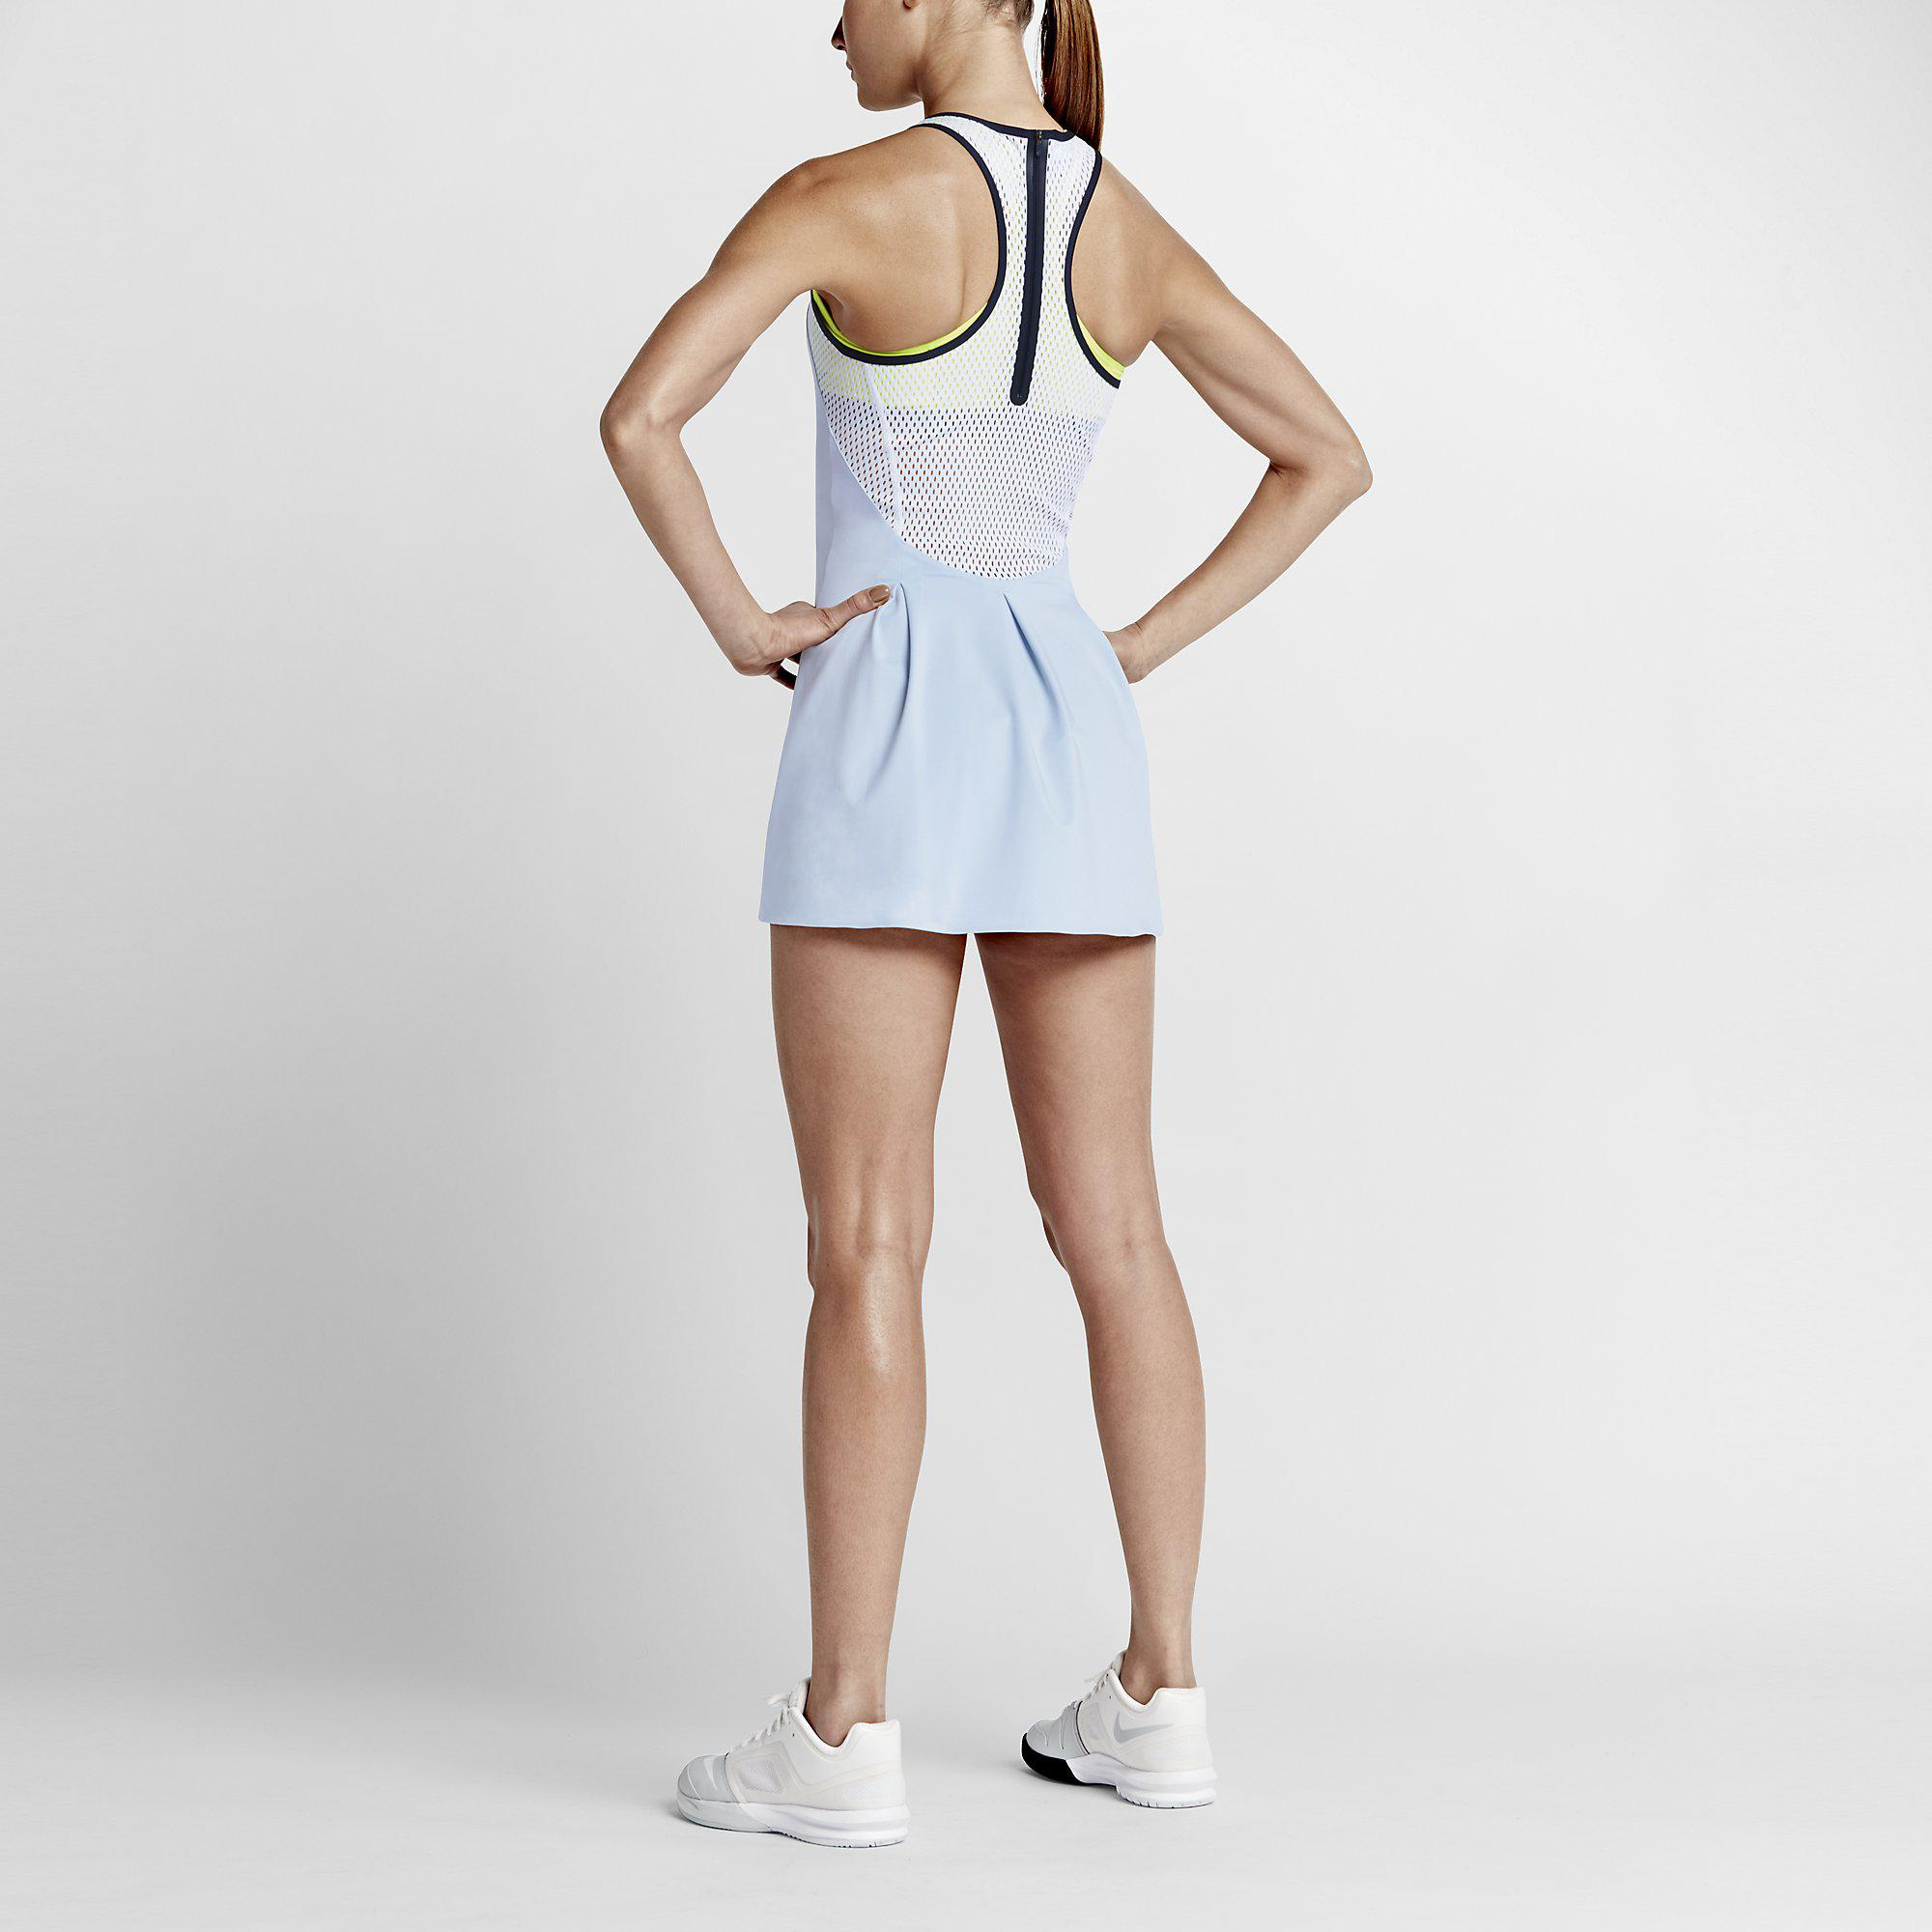 Nike Womens Premier Dress - Blue/White